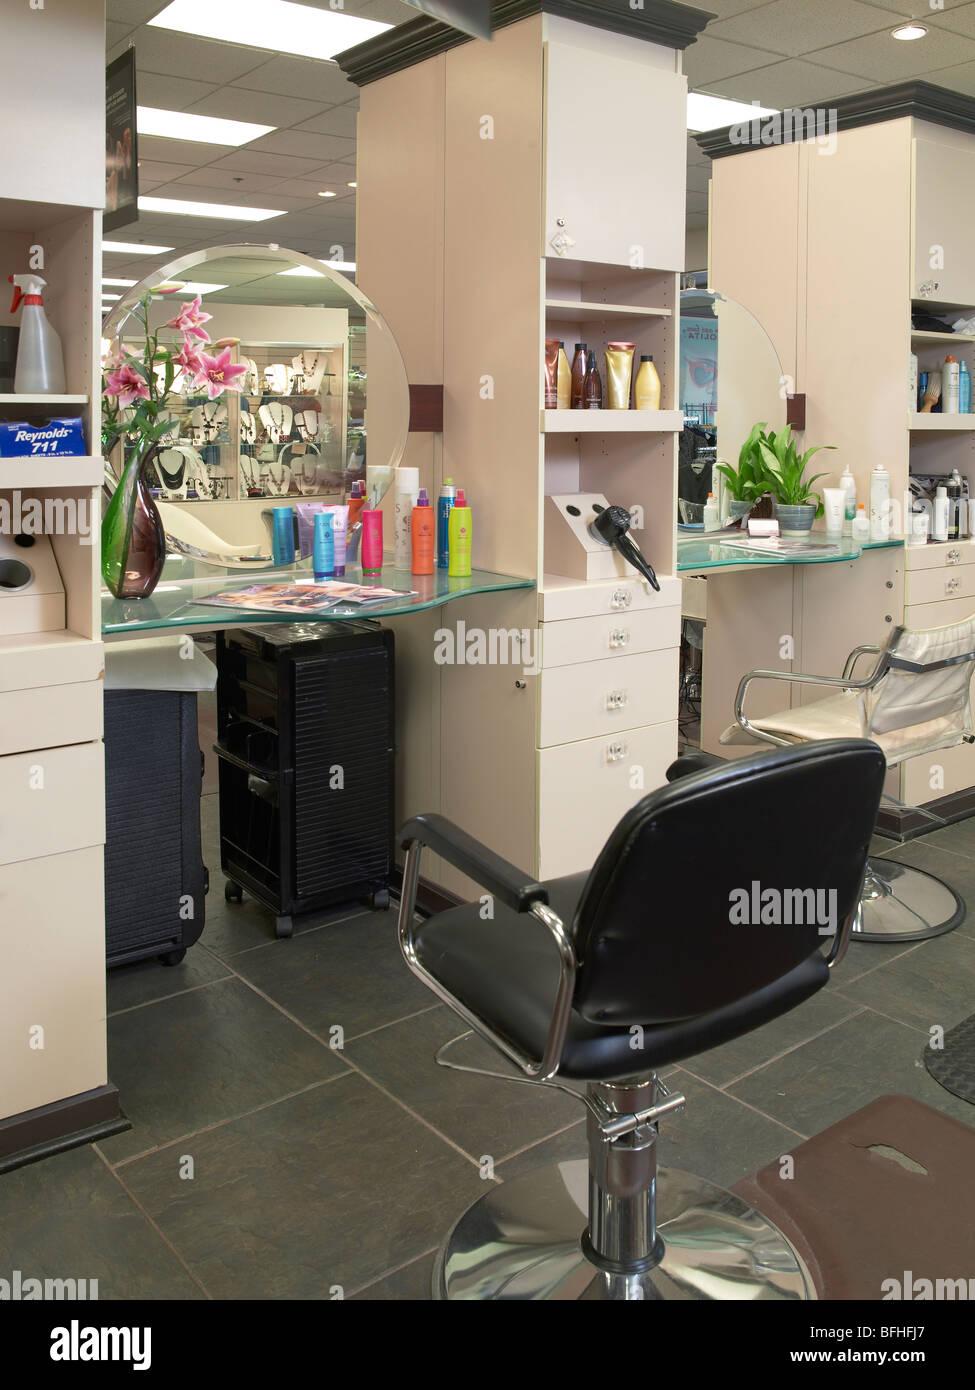 Hair Salon Barbershop - Stock Image